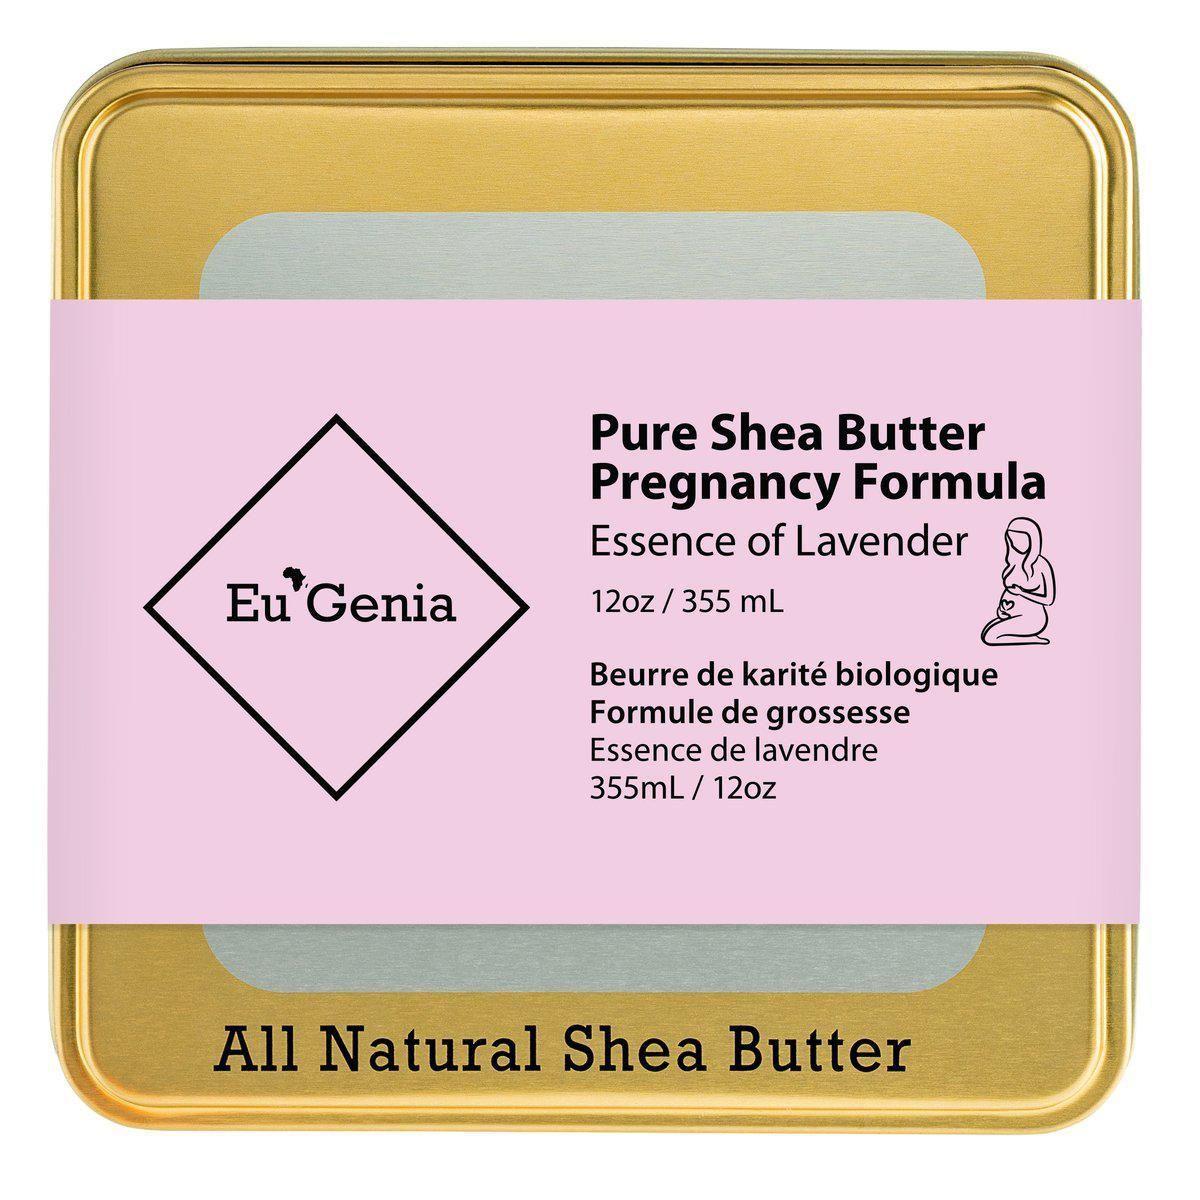 eu'genia pure shea butter pregnancy strength formula